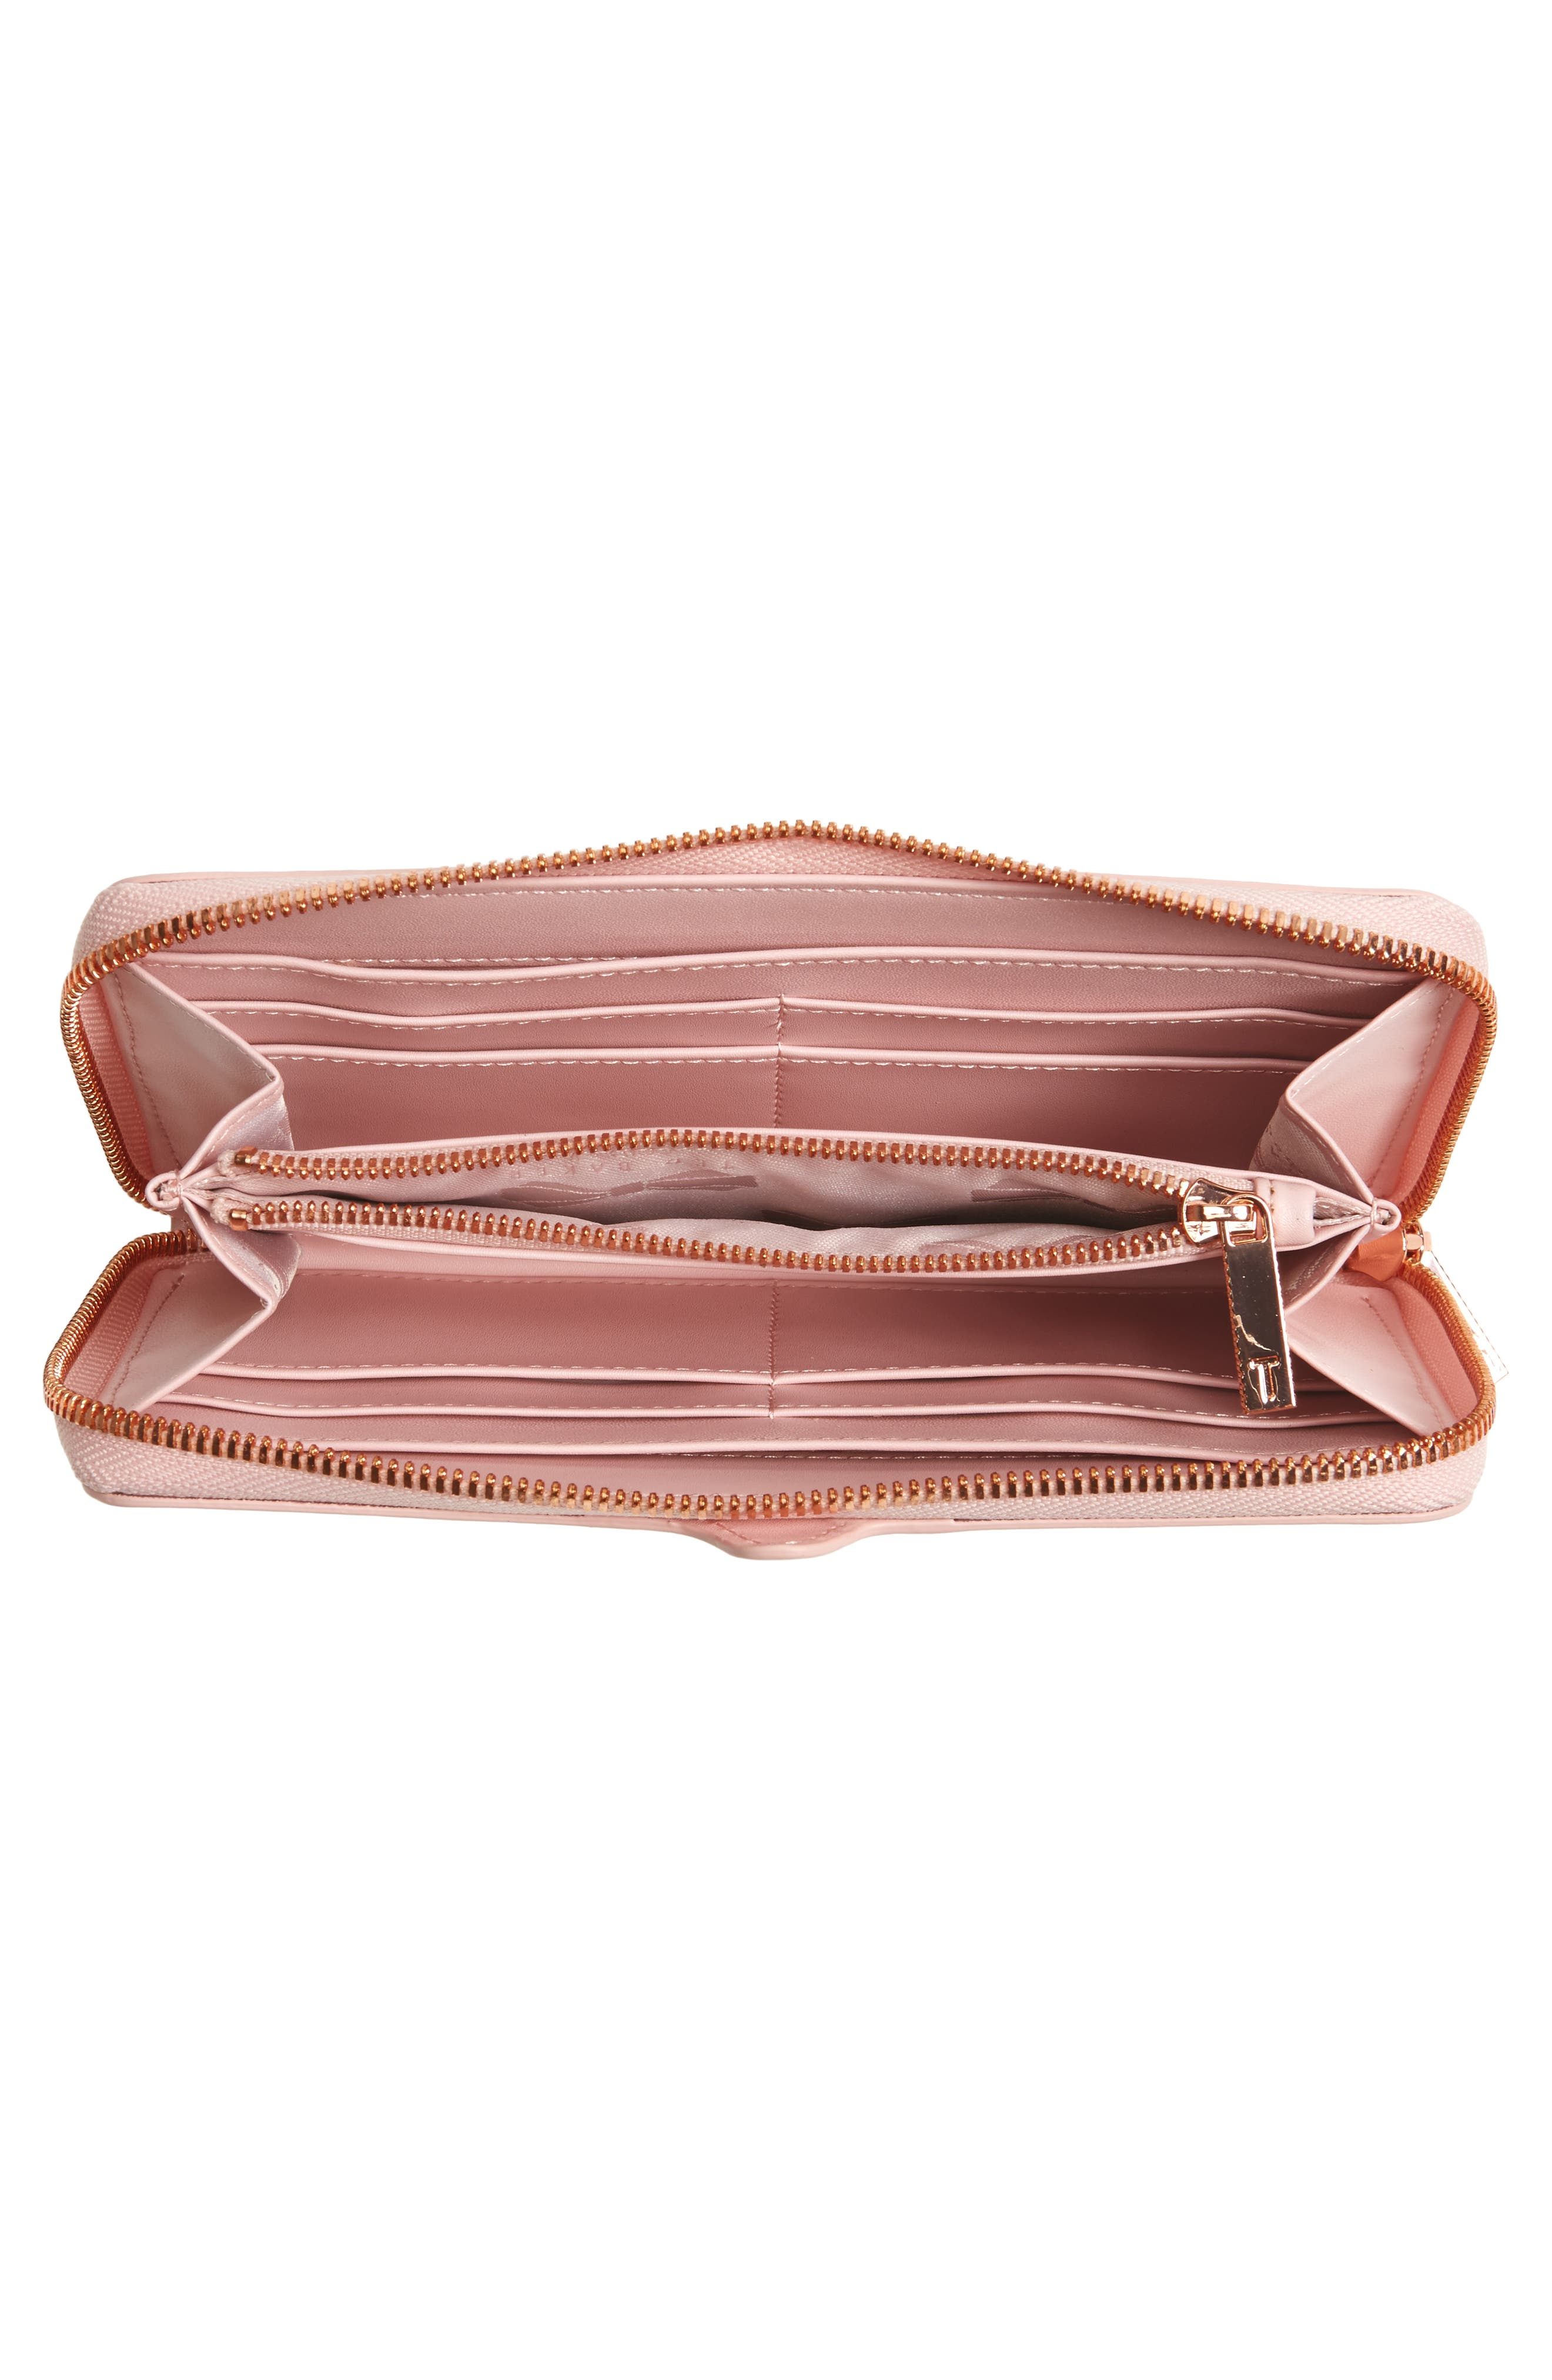 Carryn Matinée Leather Wallet,                             Alternate thumbnail 4, color,                             683